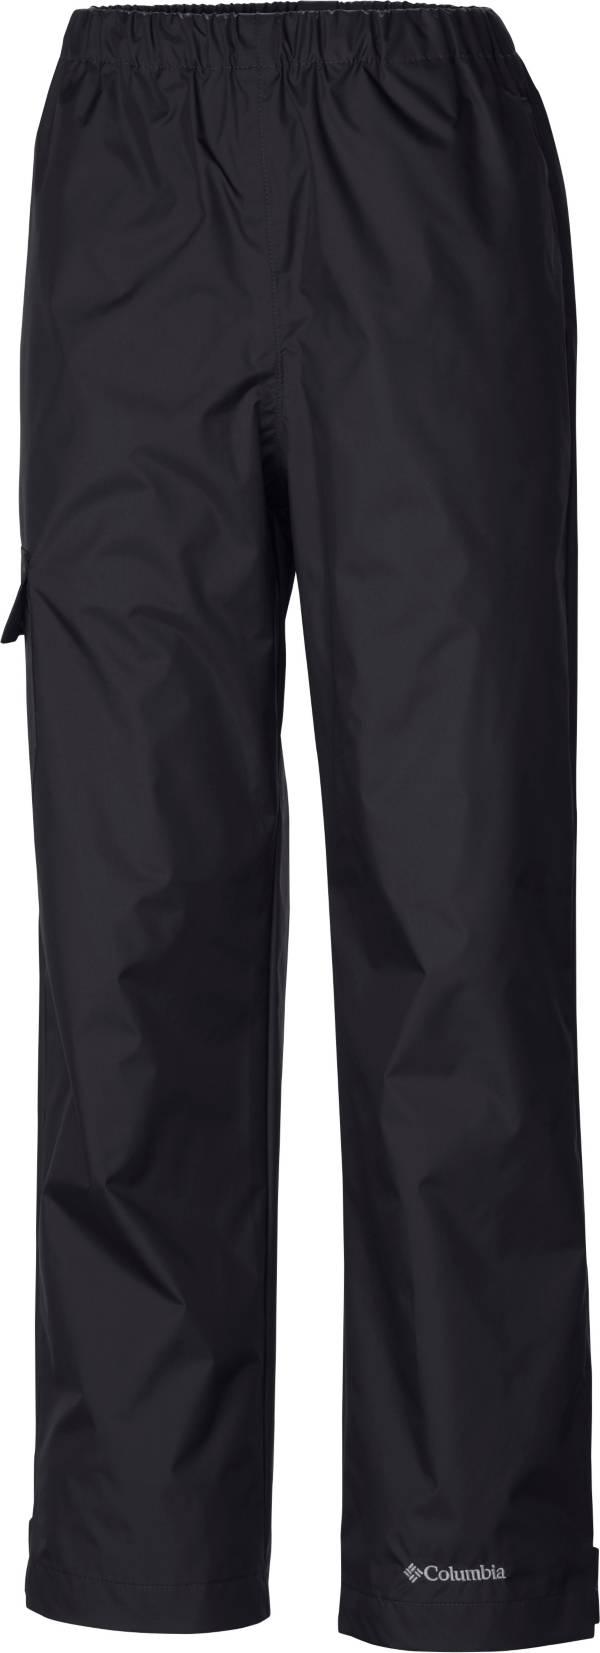 Columbia Youth Cypress Brook II Shell Pants product image